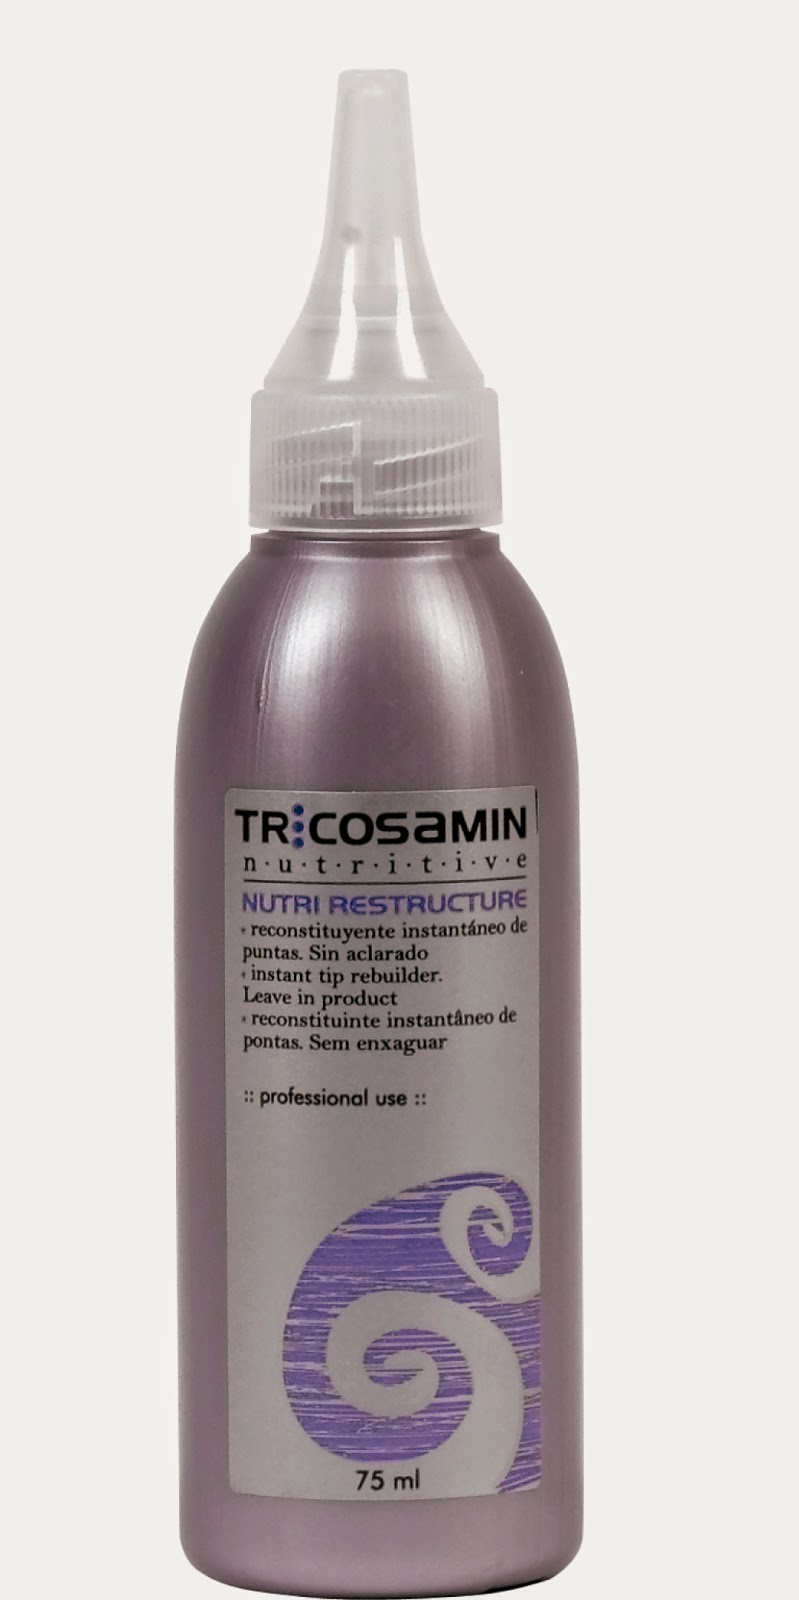 Reconstituyente de puntas Tricosamin